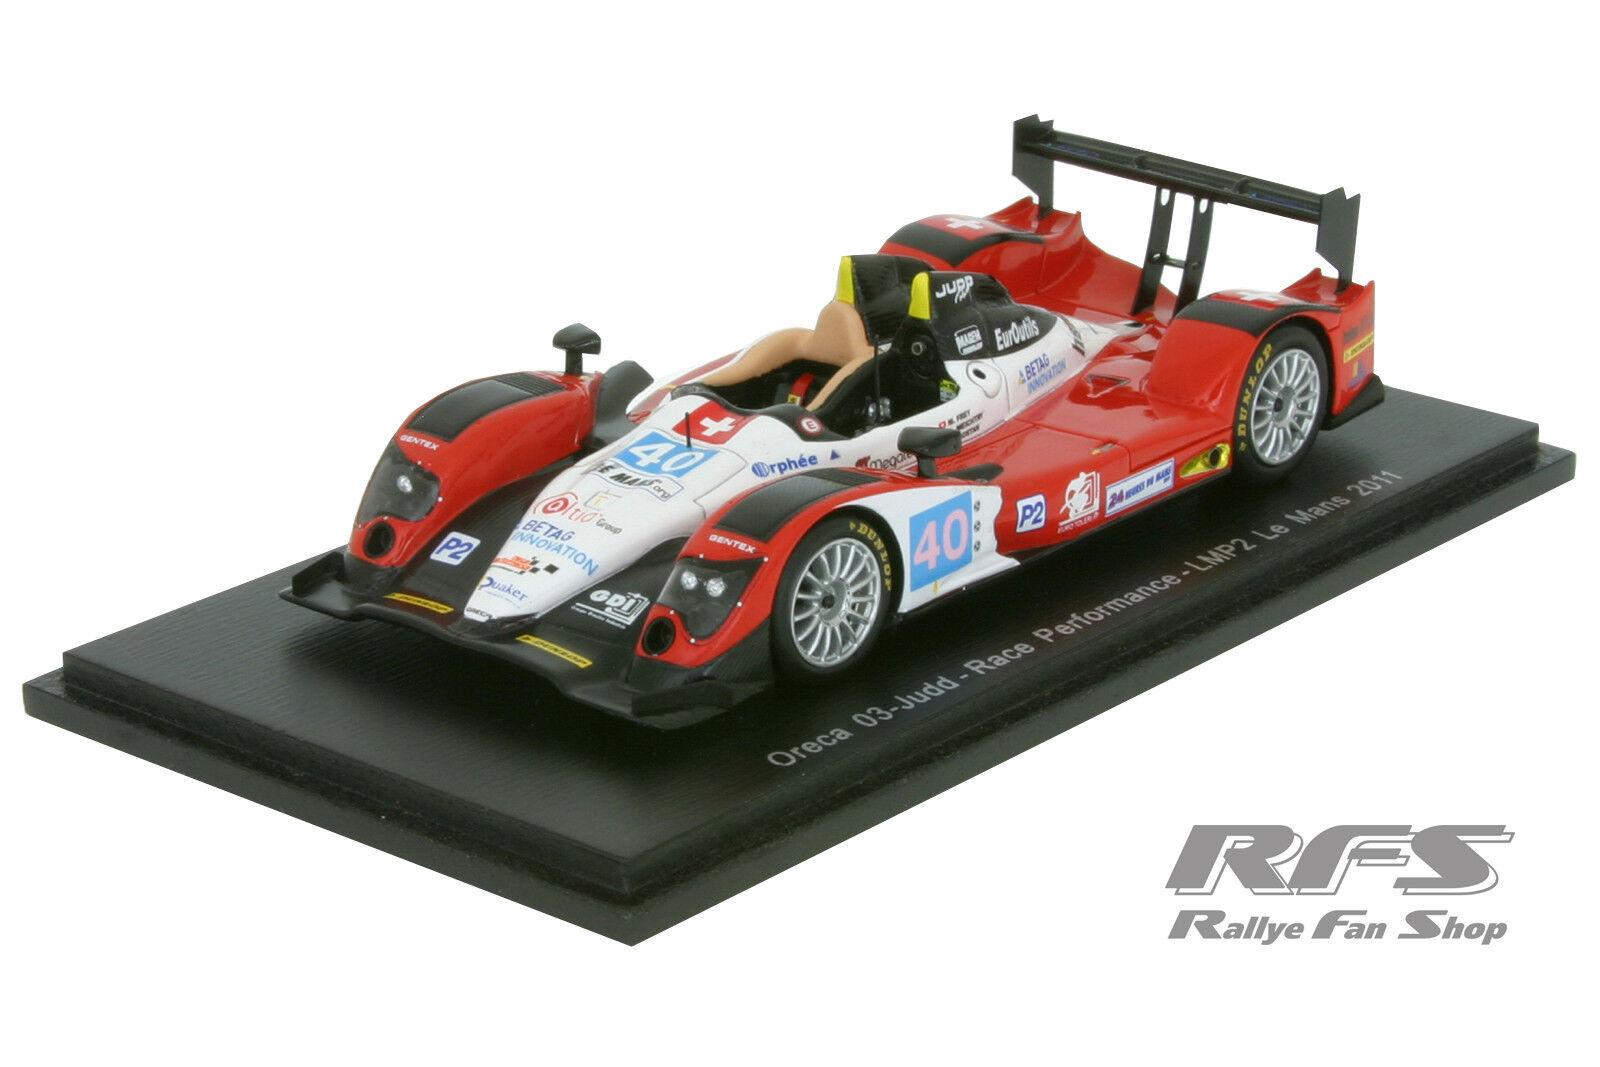 Oreca 03-Judd Bmw - 24h Le Mans 2011-FREY Meichtry - 1 43 spark 4555